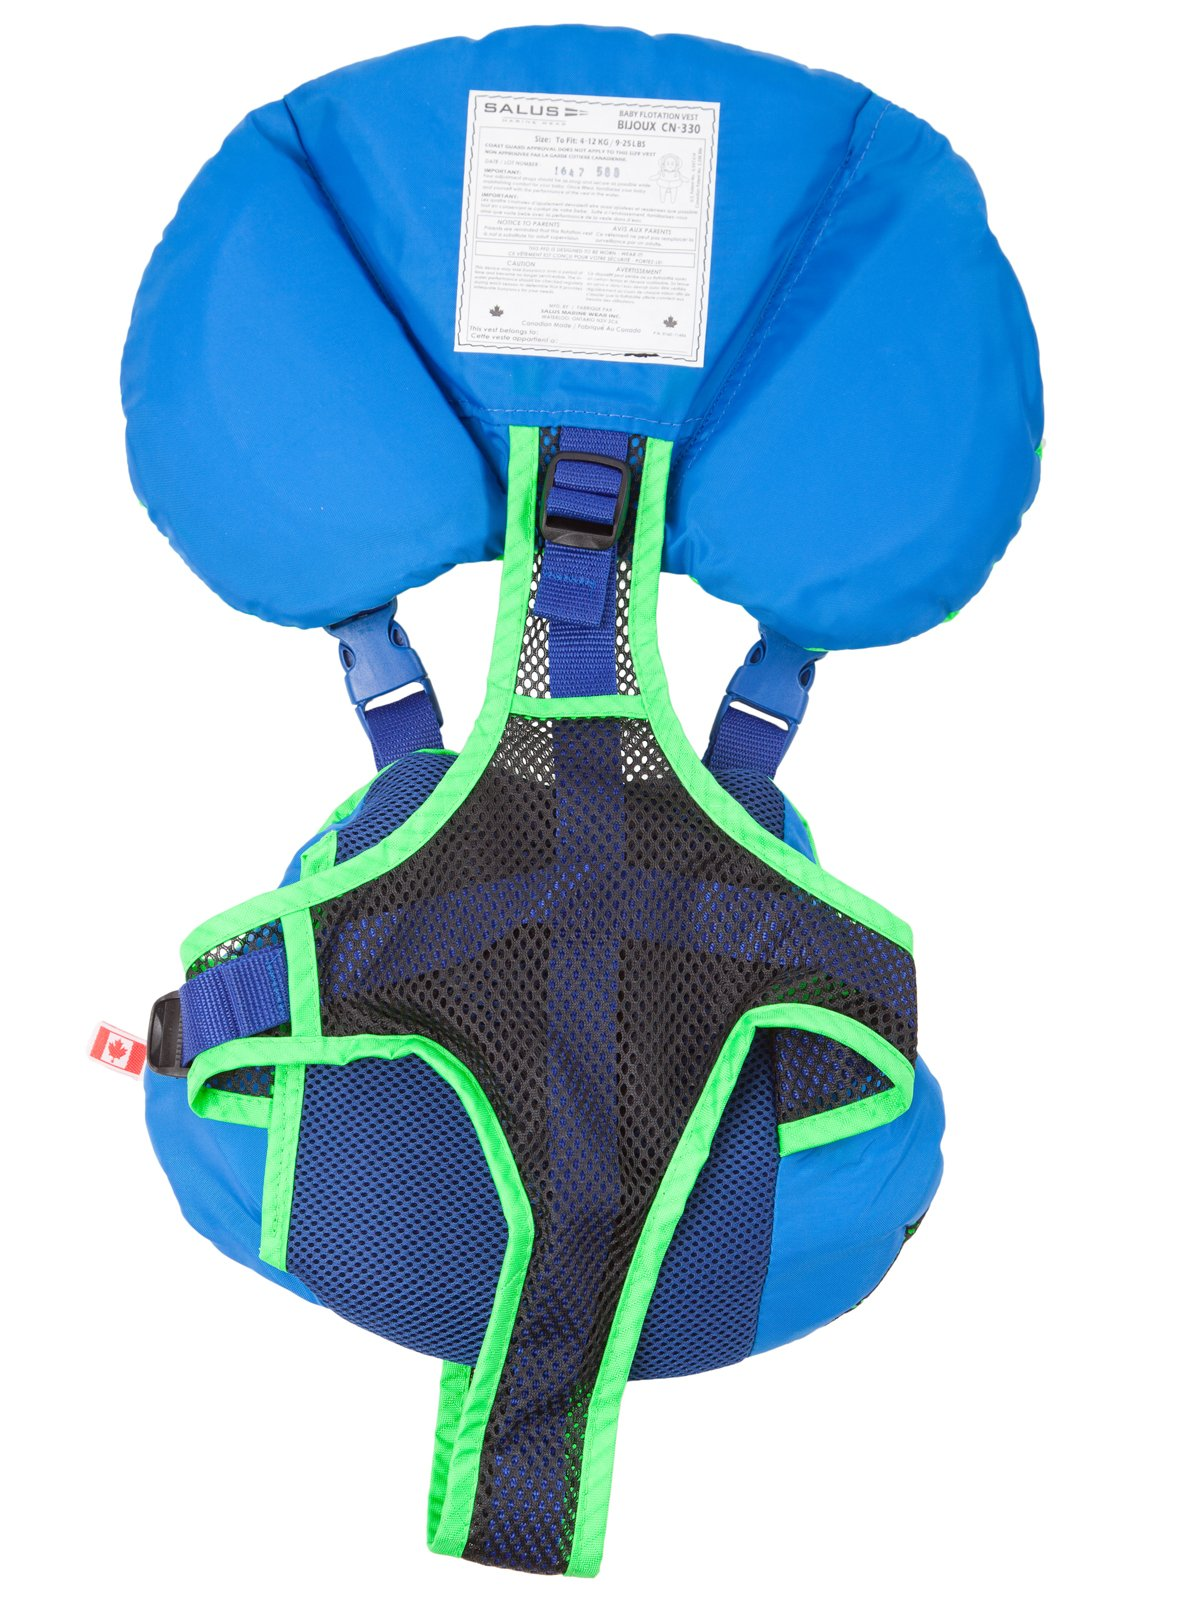 Salus Bijoux Baby Vest - Lime by Salus (Image #3)